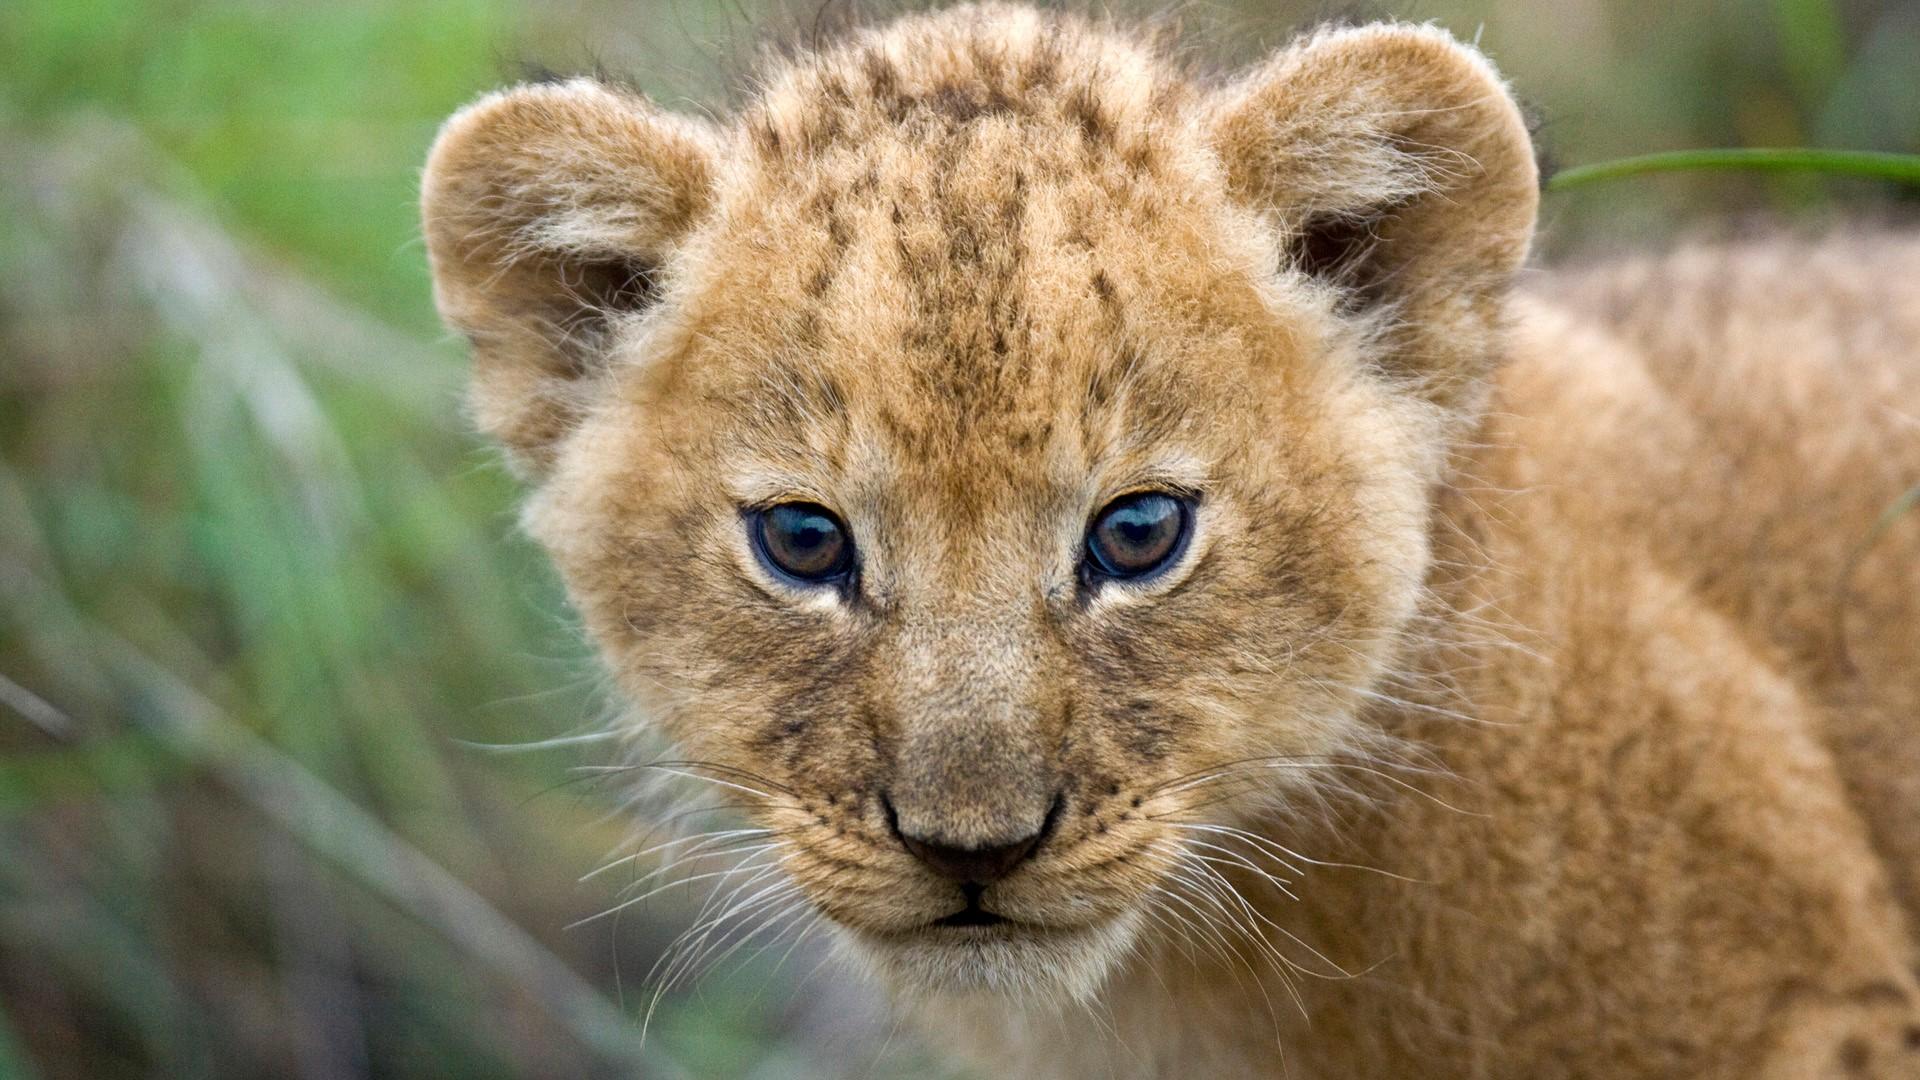 Beautiful Cute Lion Cub Closeup Face HD Wallpapers HD Wallpapers 1920x1080